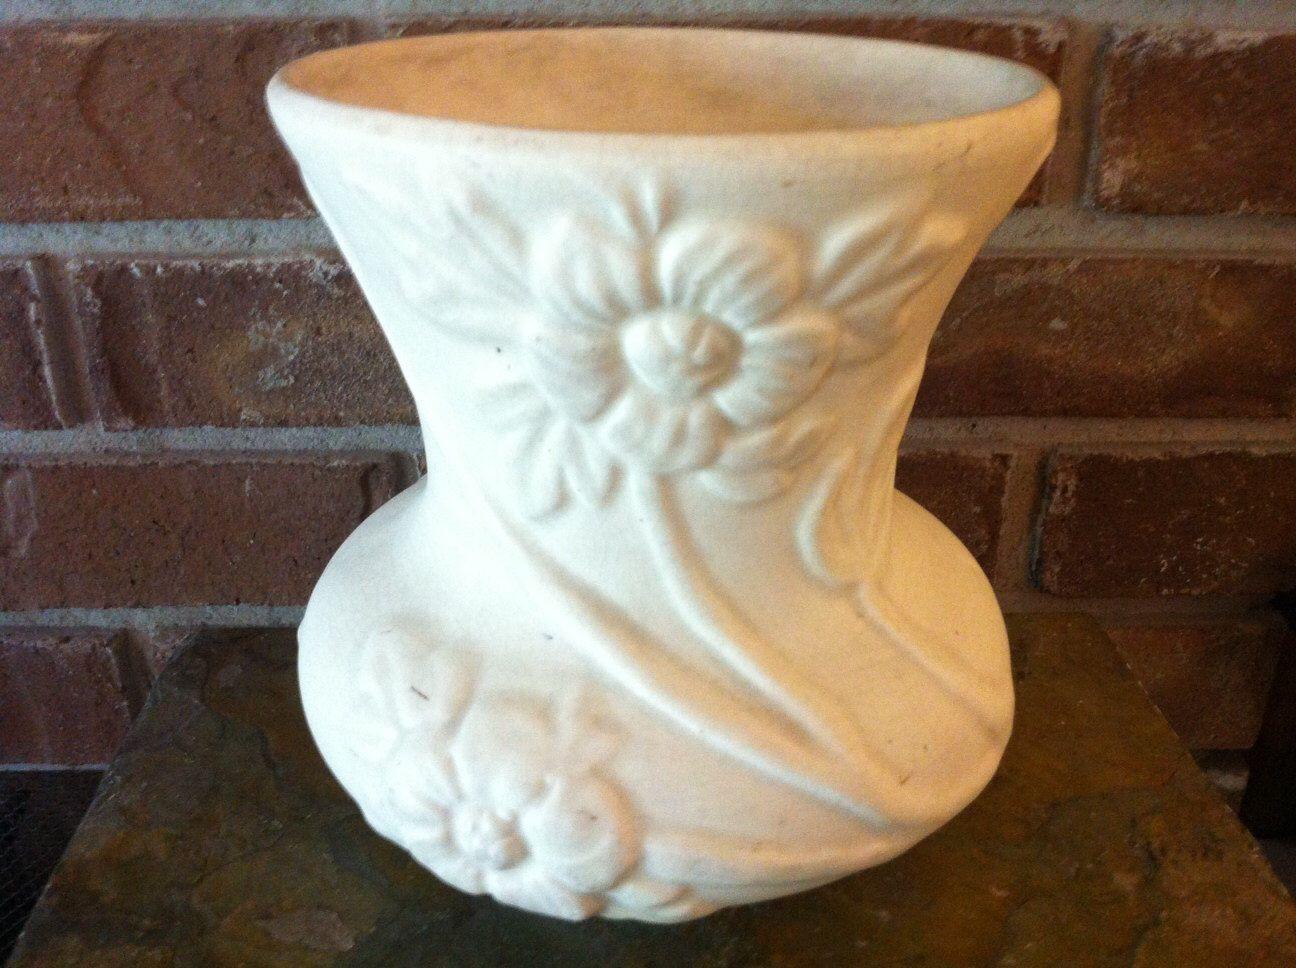 mccoy white vase of vintage art pottery hull pottery crab apple matte white art pottery throughout vintage art pottery hull pottery crab apple matte white art pottery vase crab apple